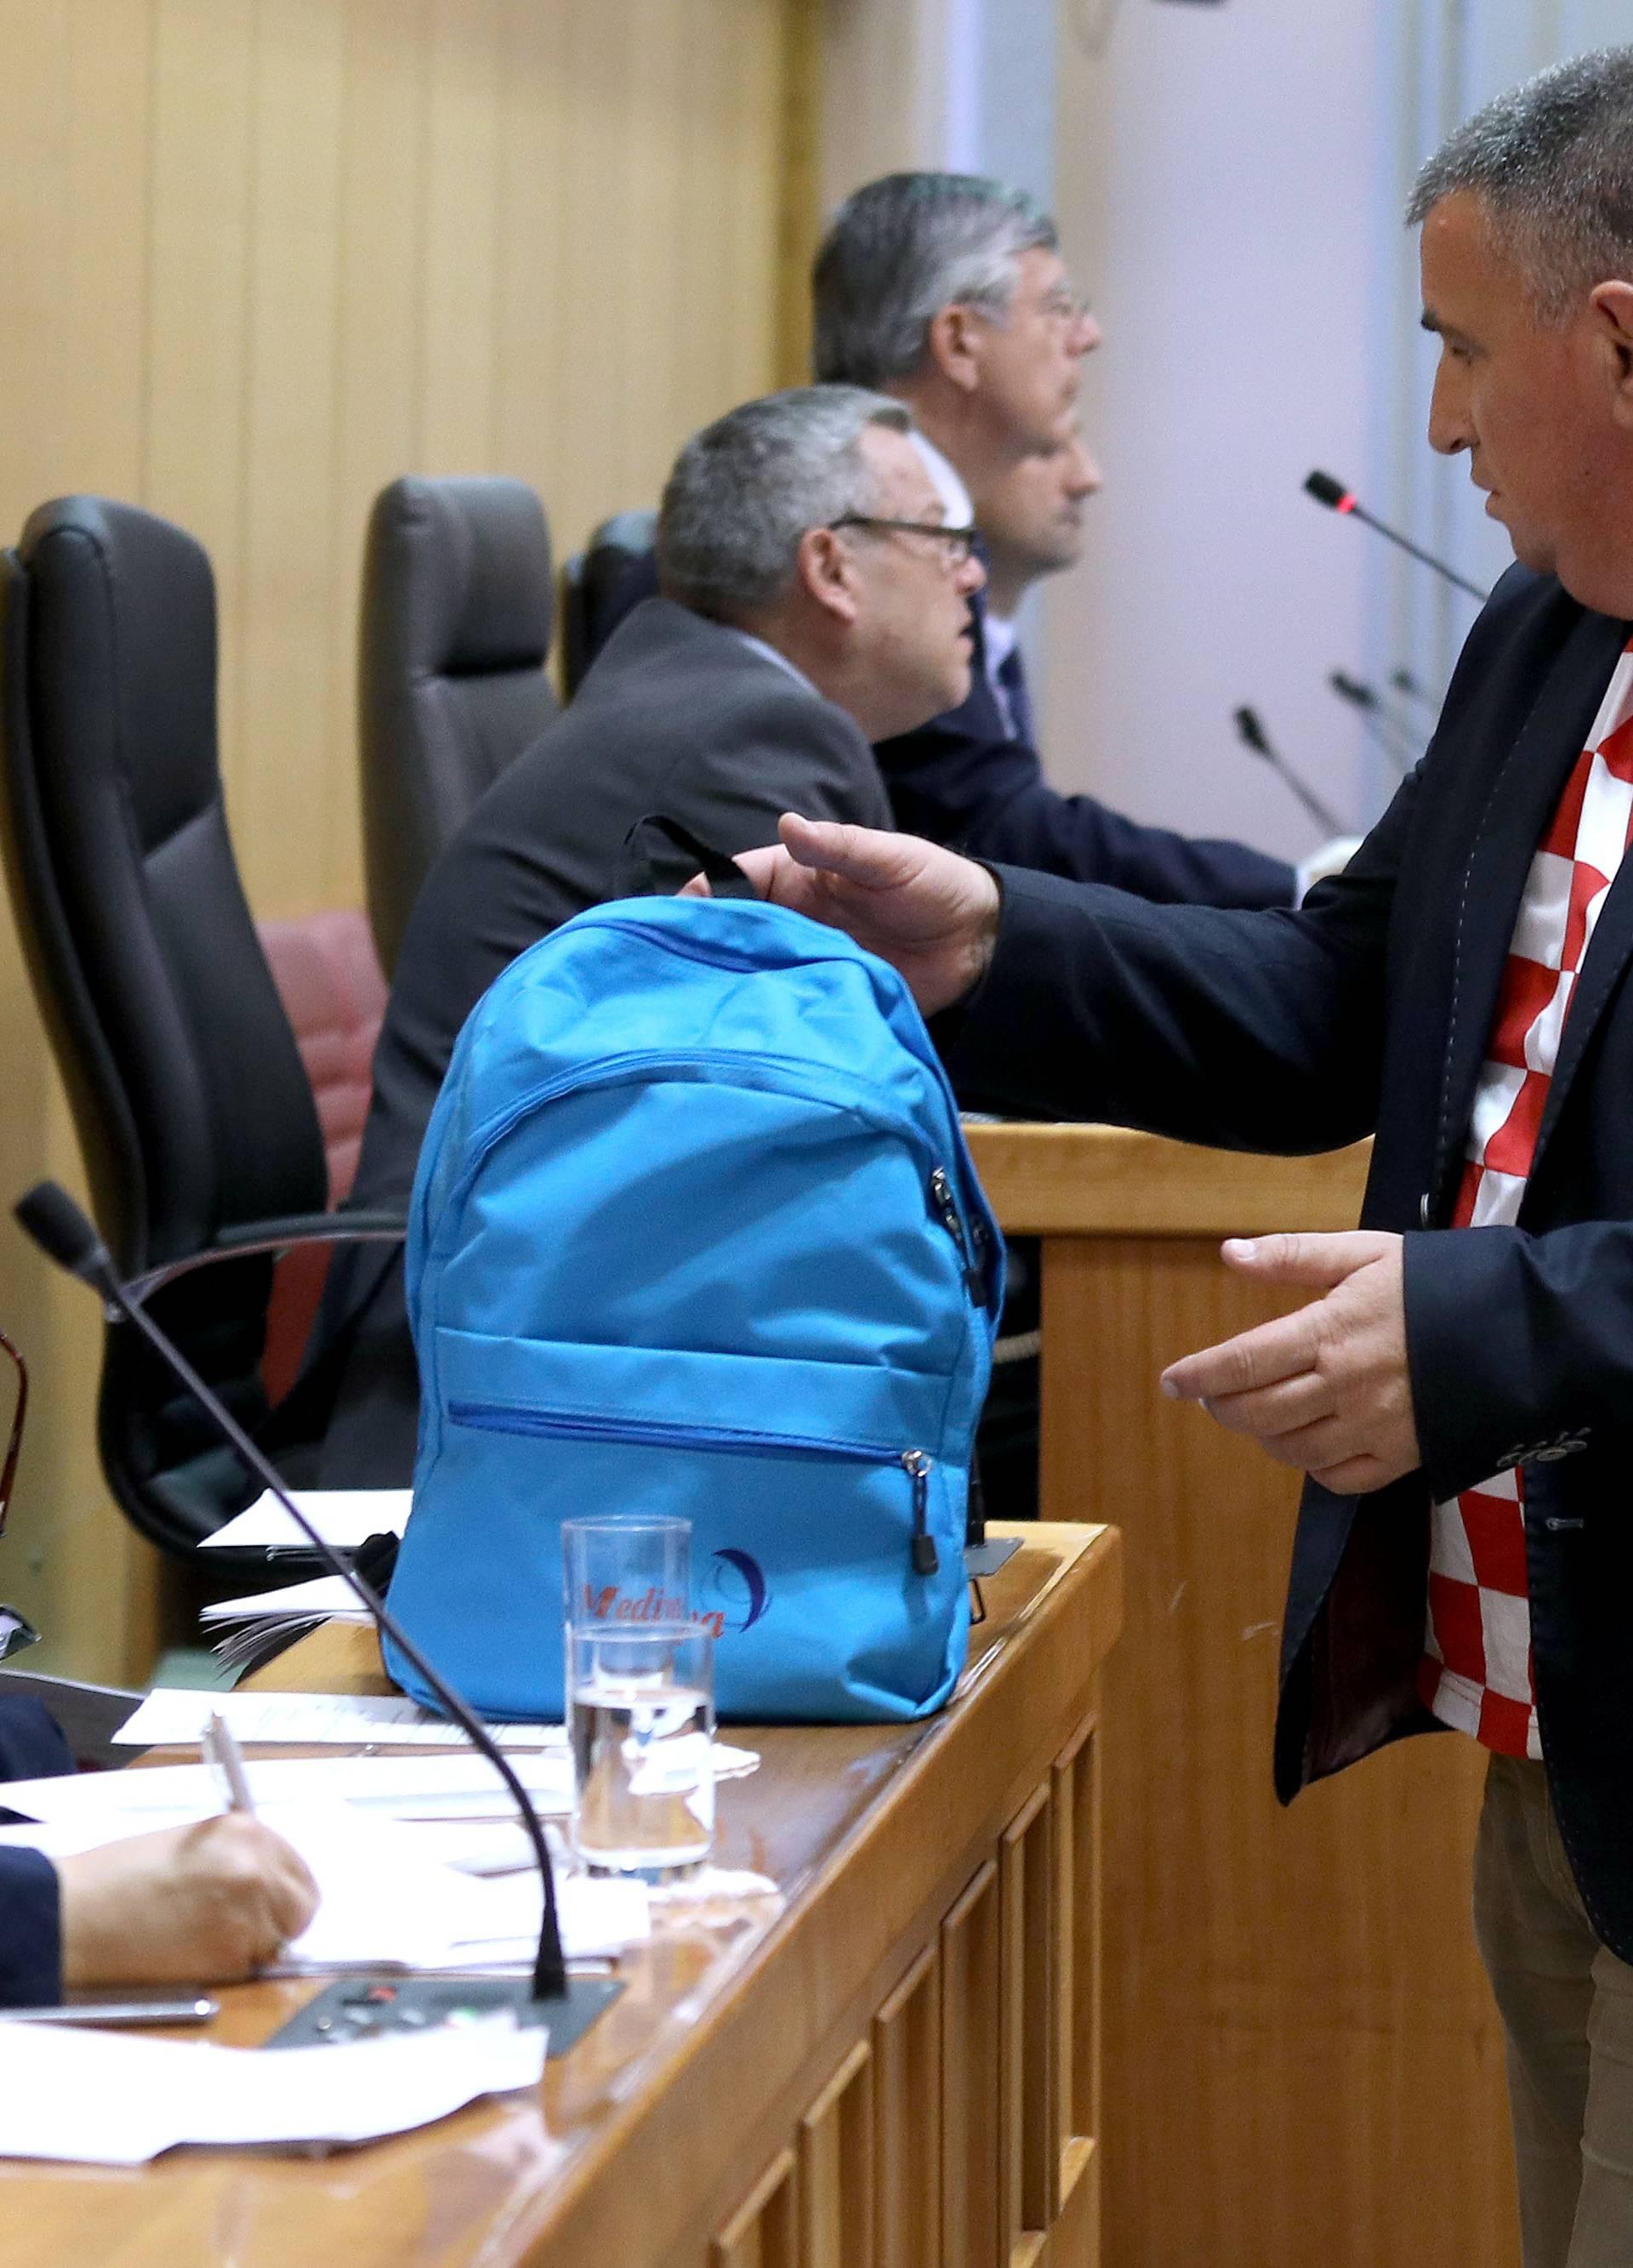 Zagreb: Bulj poklonio ministrici Divjak torbu kao simbol (ne)provedbe reforme